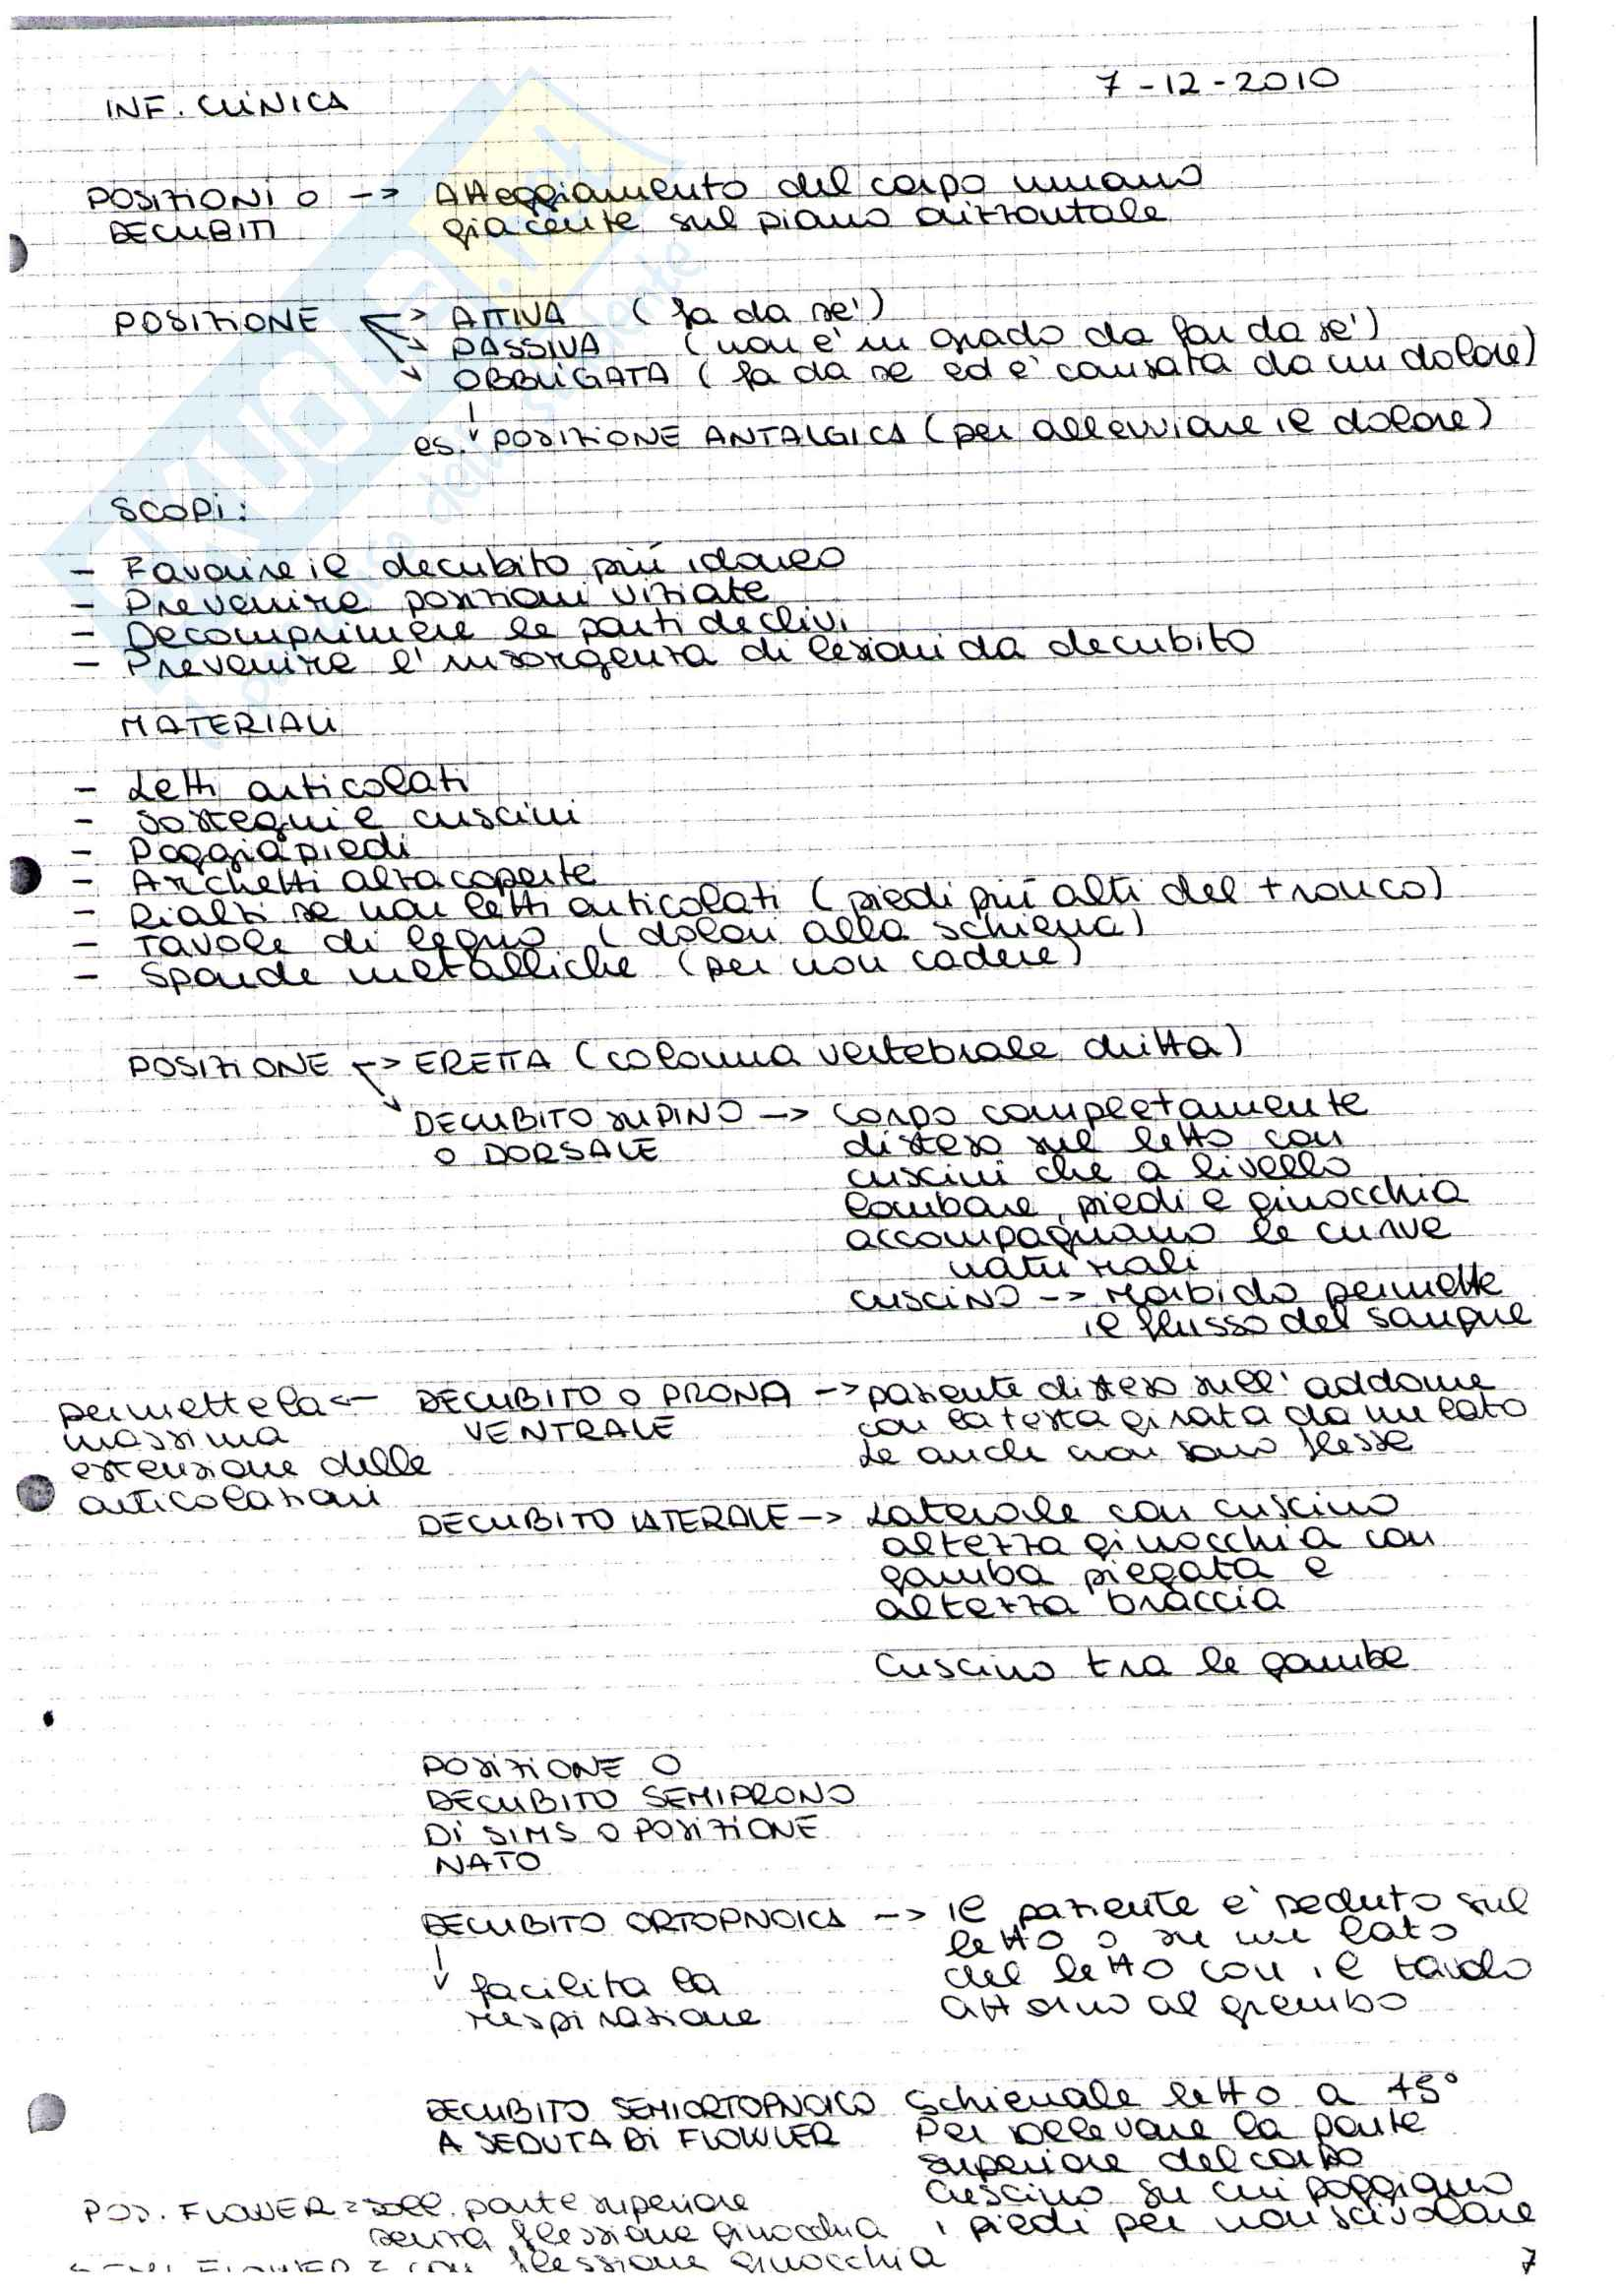 Infermieristica I - Infermieristica clinica Pag. 11